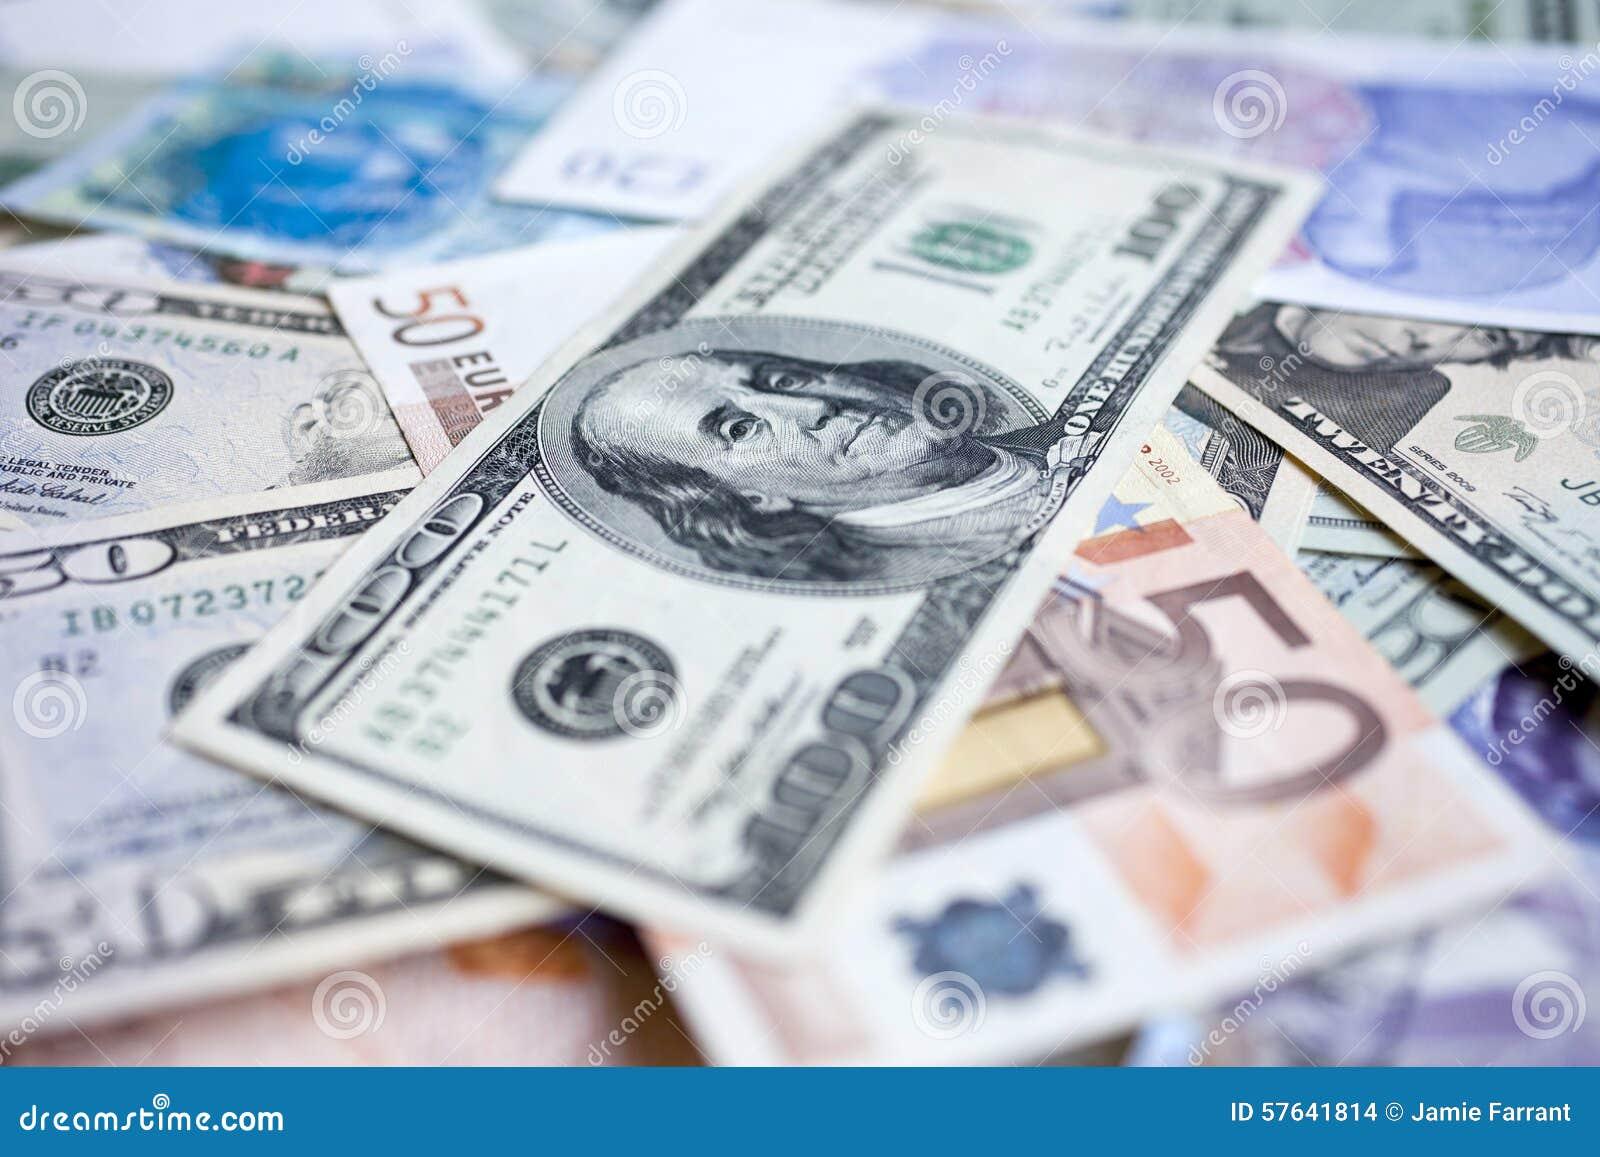 International money pile stock photo. Image of euro, financial - 57641814